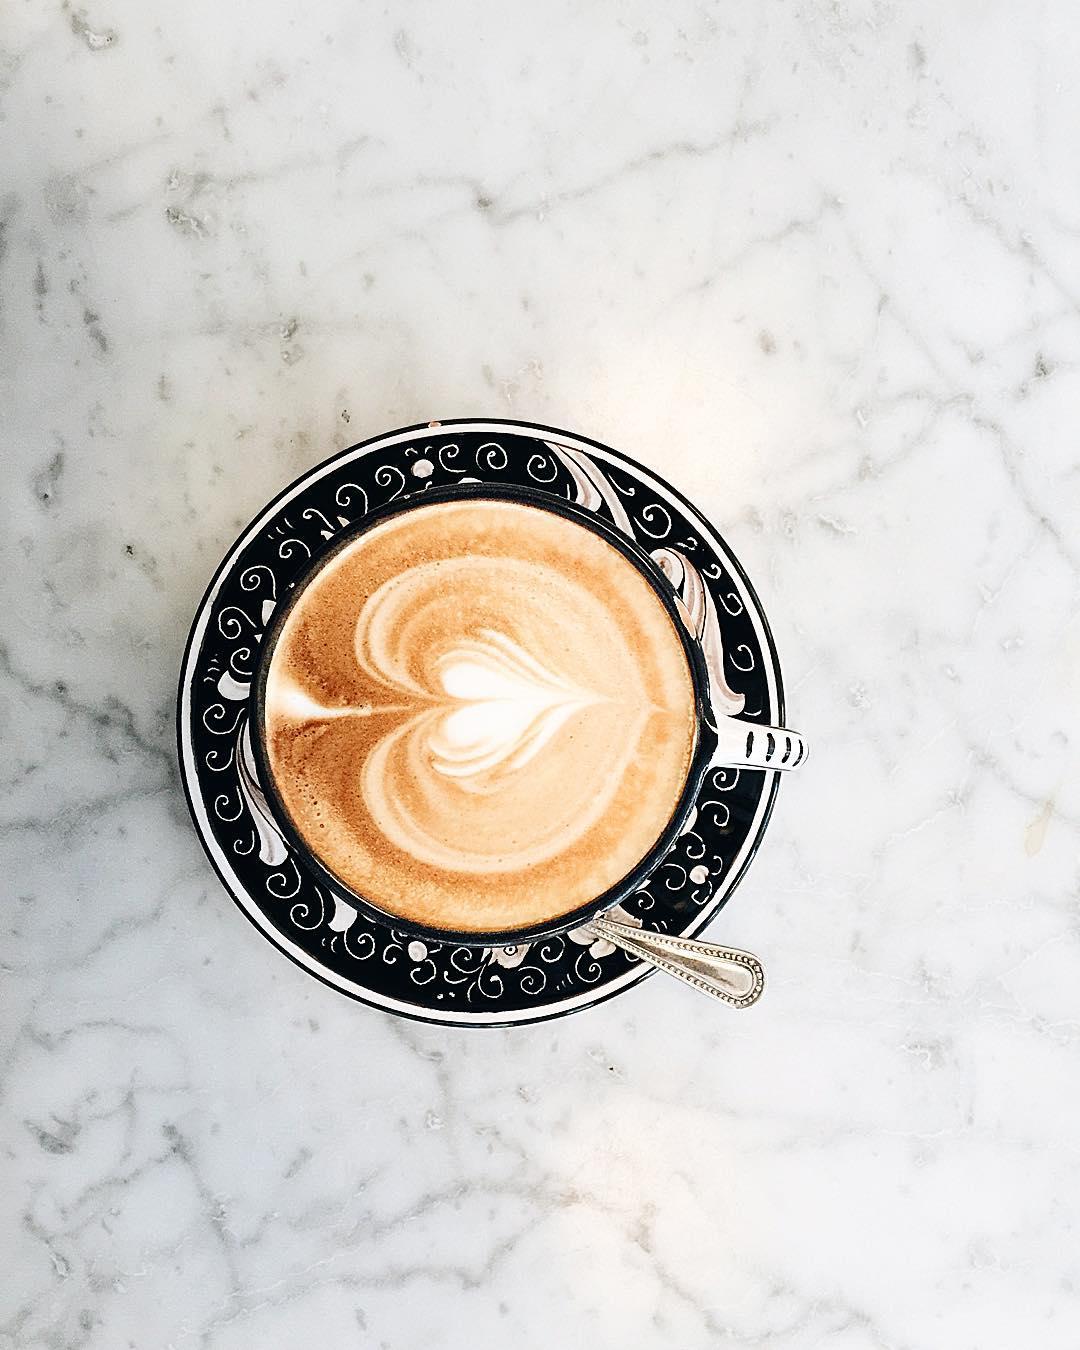 Last Coffee in New York  To Salt Lake Cityhellip